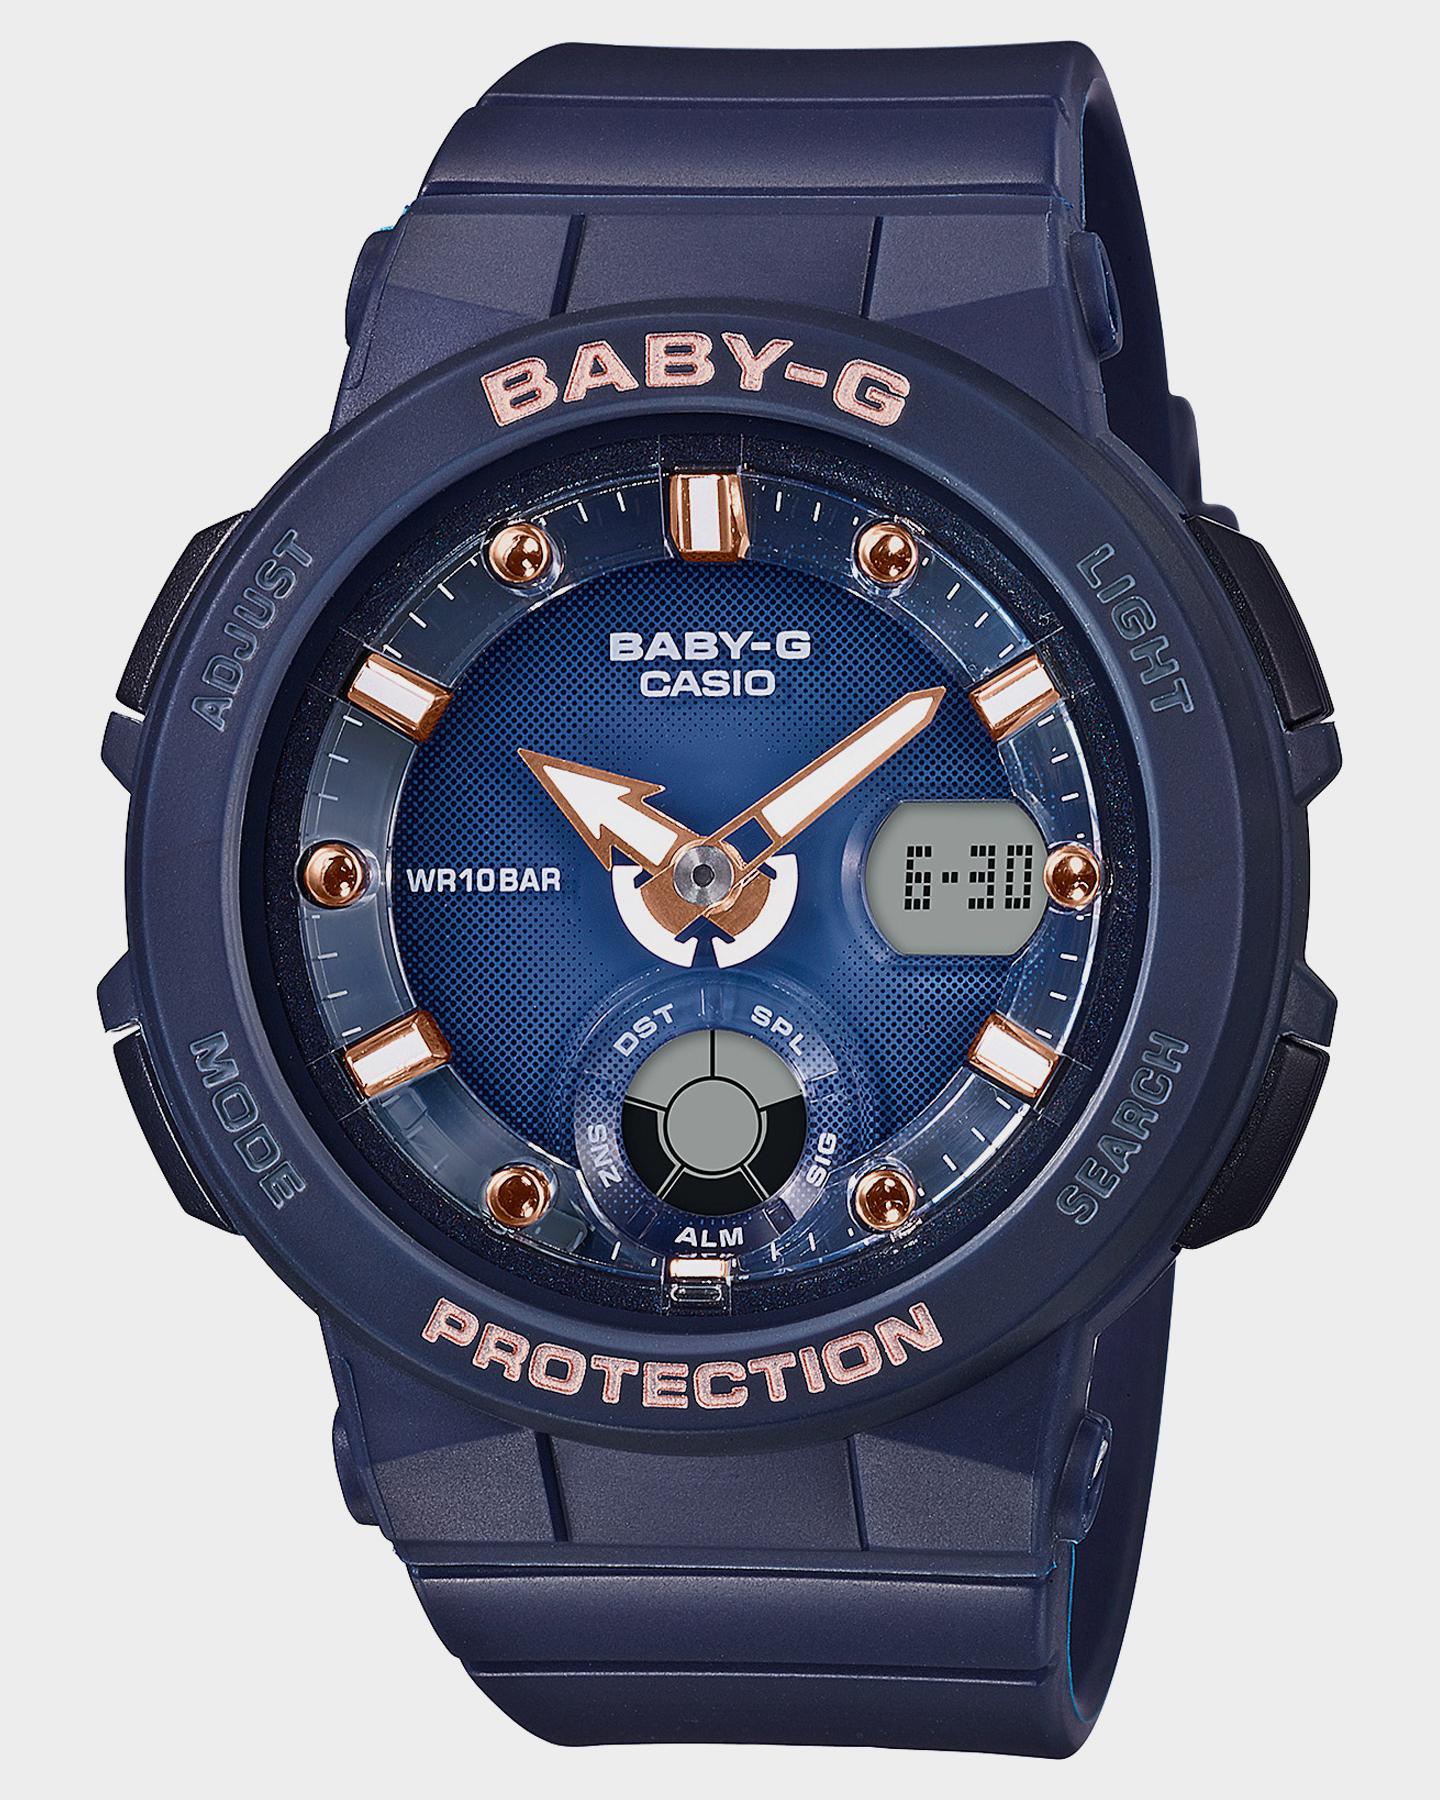 Baby G Bga250 Beach Traveller Series Watch Navy Navy